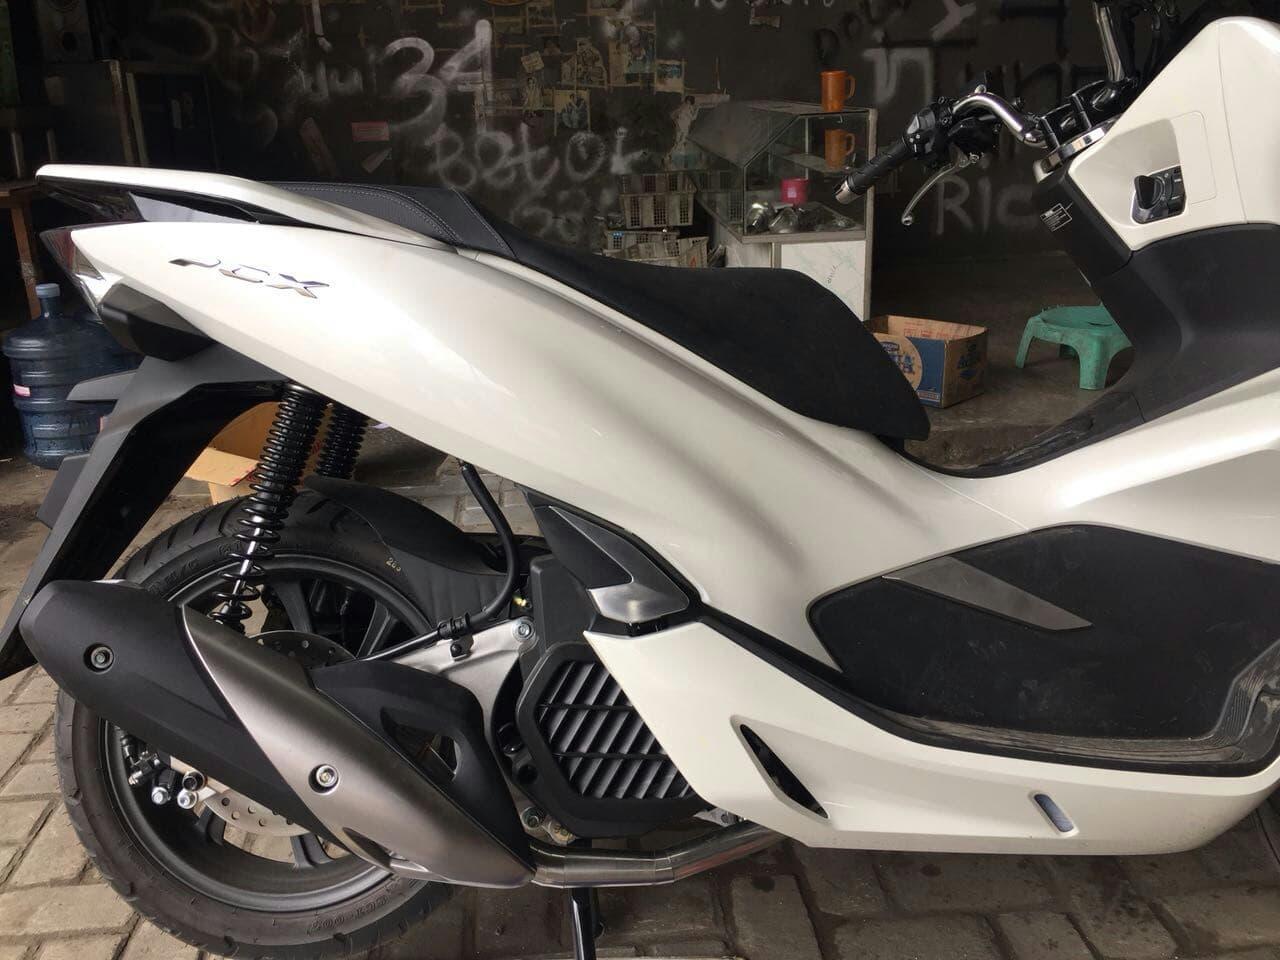 Fitur Knalpot Racing Bobokan Standar Honda Pcx 150 2018 Ag Tech Matic Mio J Gt Merk Csr Detail Gambar Best Seller Terbaru